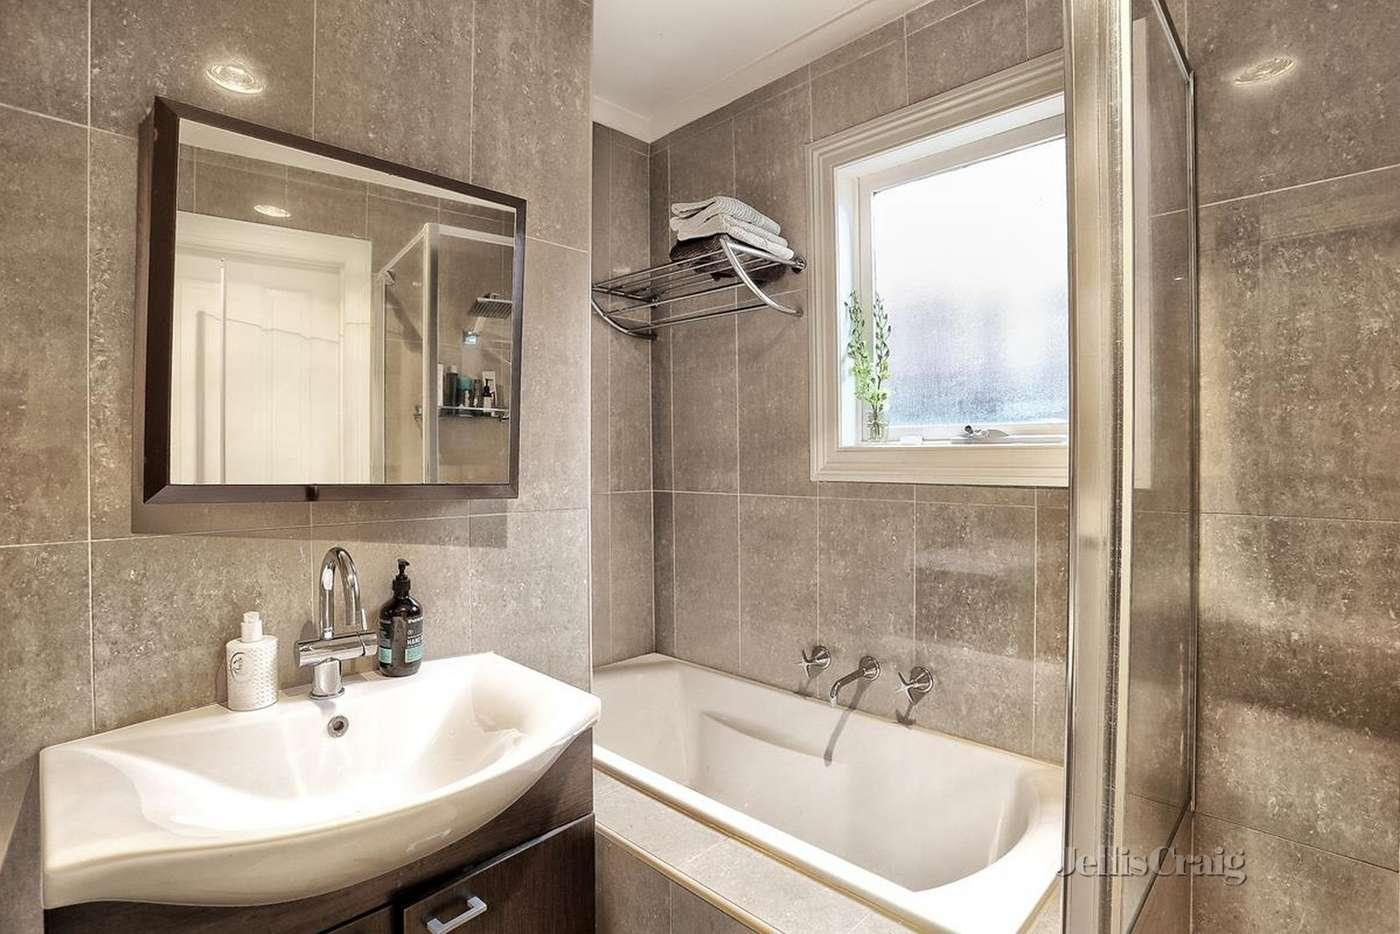 13 Davies Street Brunswick VIC 3056 For Rent